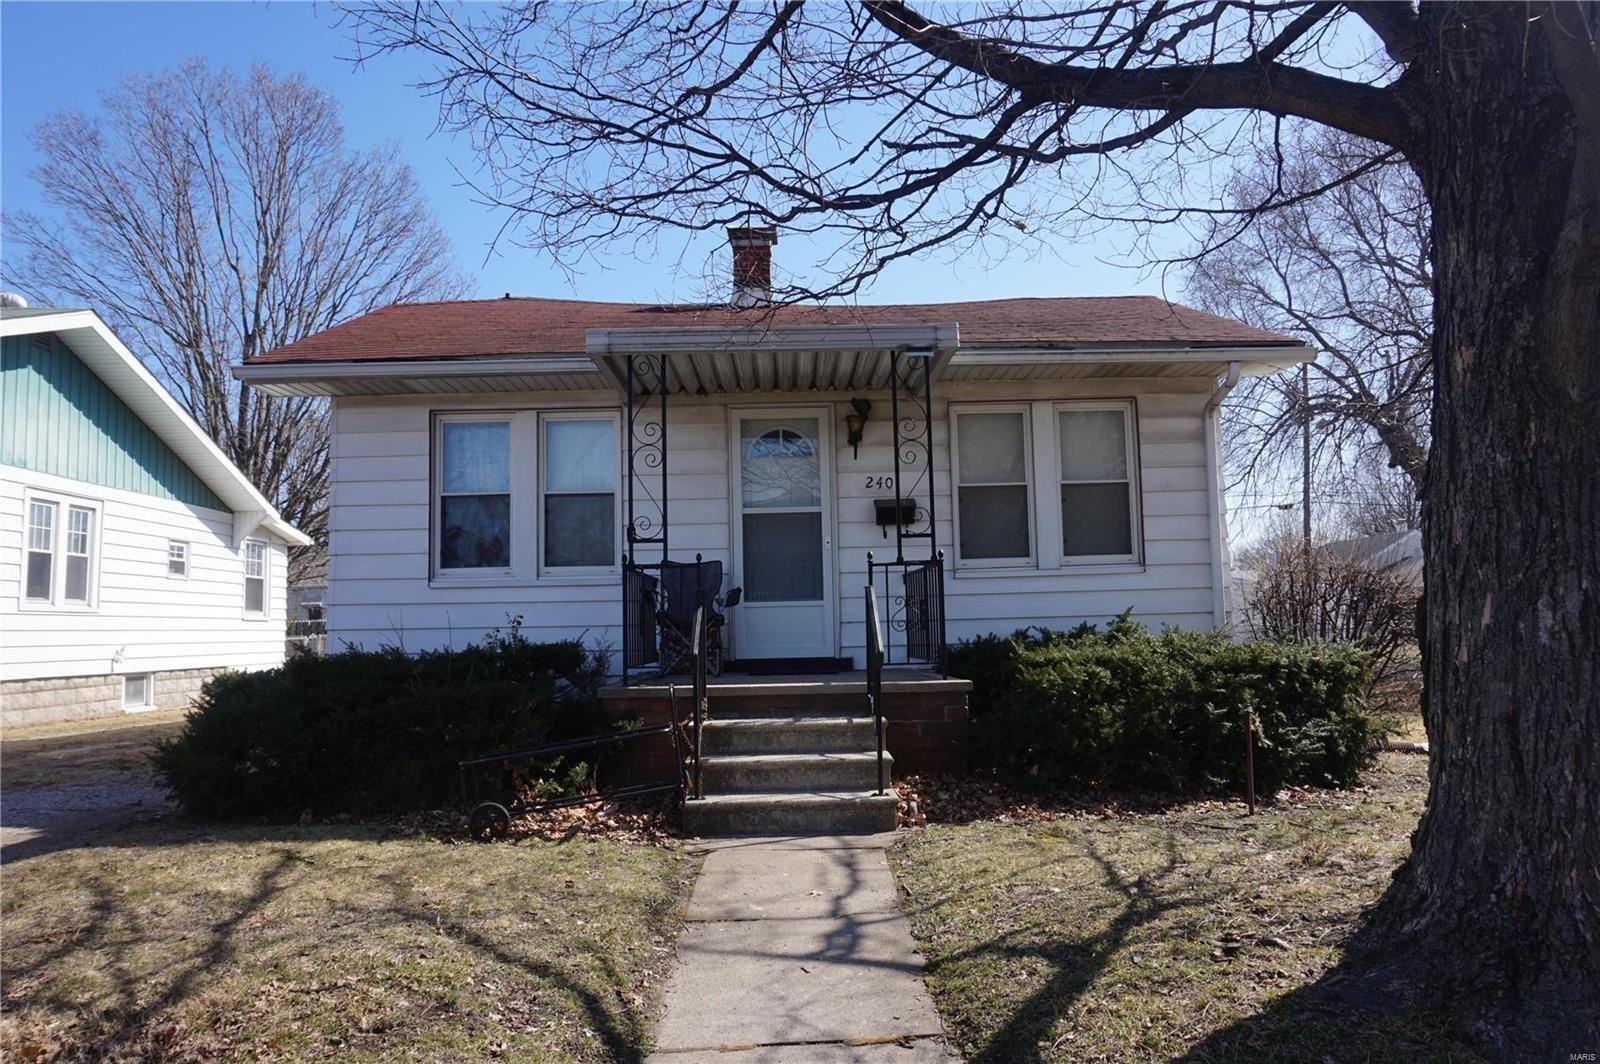 240 Ohio, East Alton, IL 62024 - MLS#: 21013794